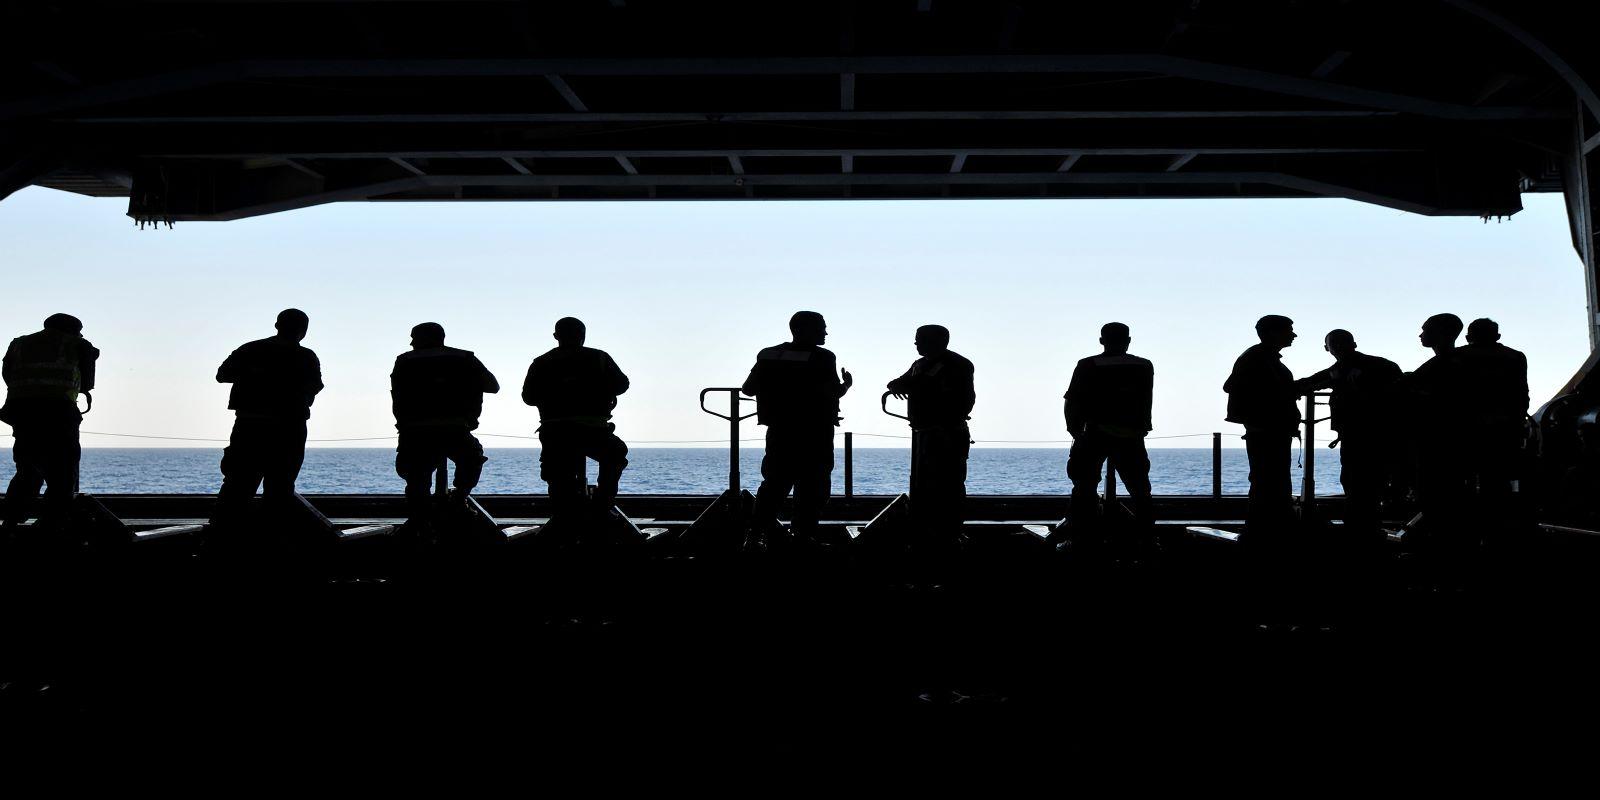 sailors aboard the aircraft carrier USS Carl Vinson